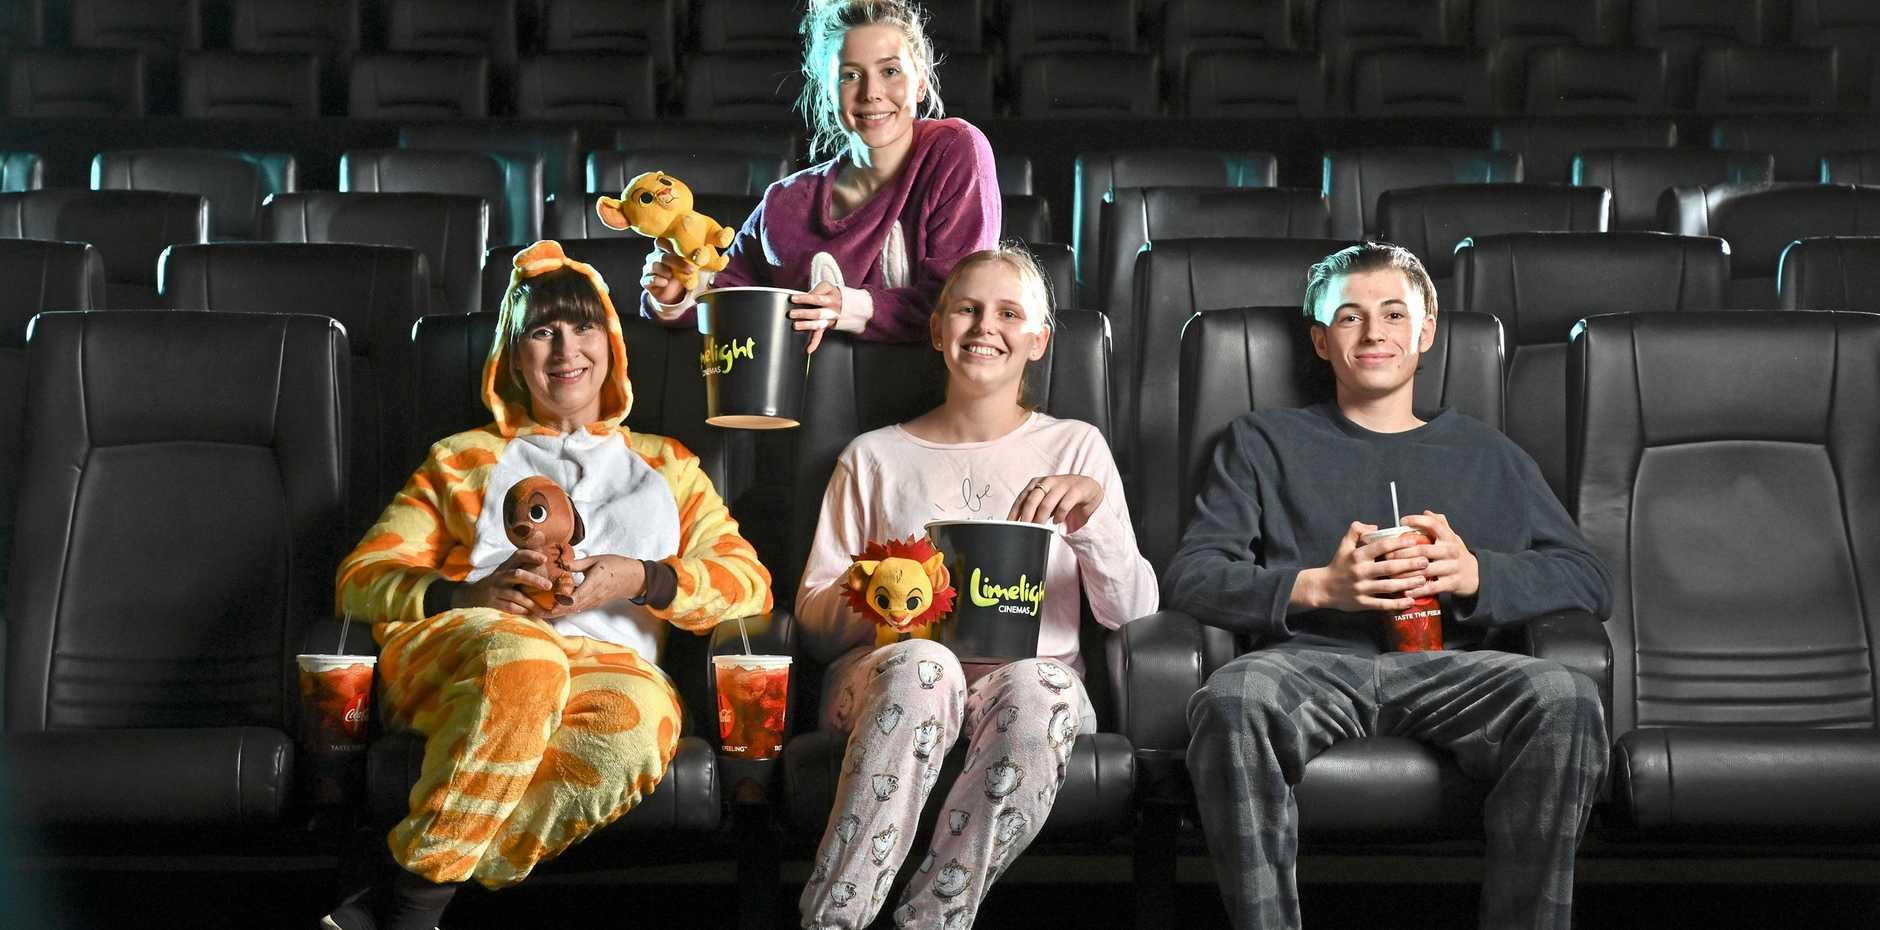 PYJAMA PARTY: Tracey Tienan, Reegan Johnston, Ebony Jackson and Noah Atley ahead of Limelight's Big Kids Pyjama Party Screening of  Th e Lion King.